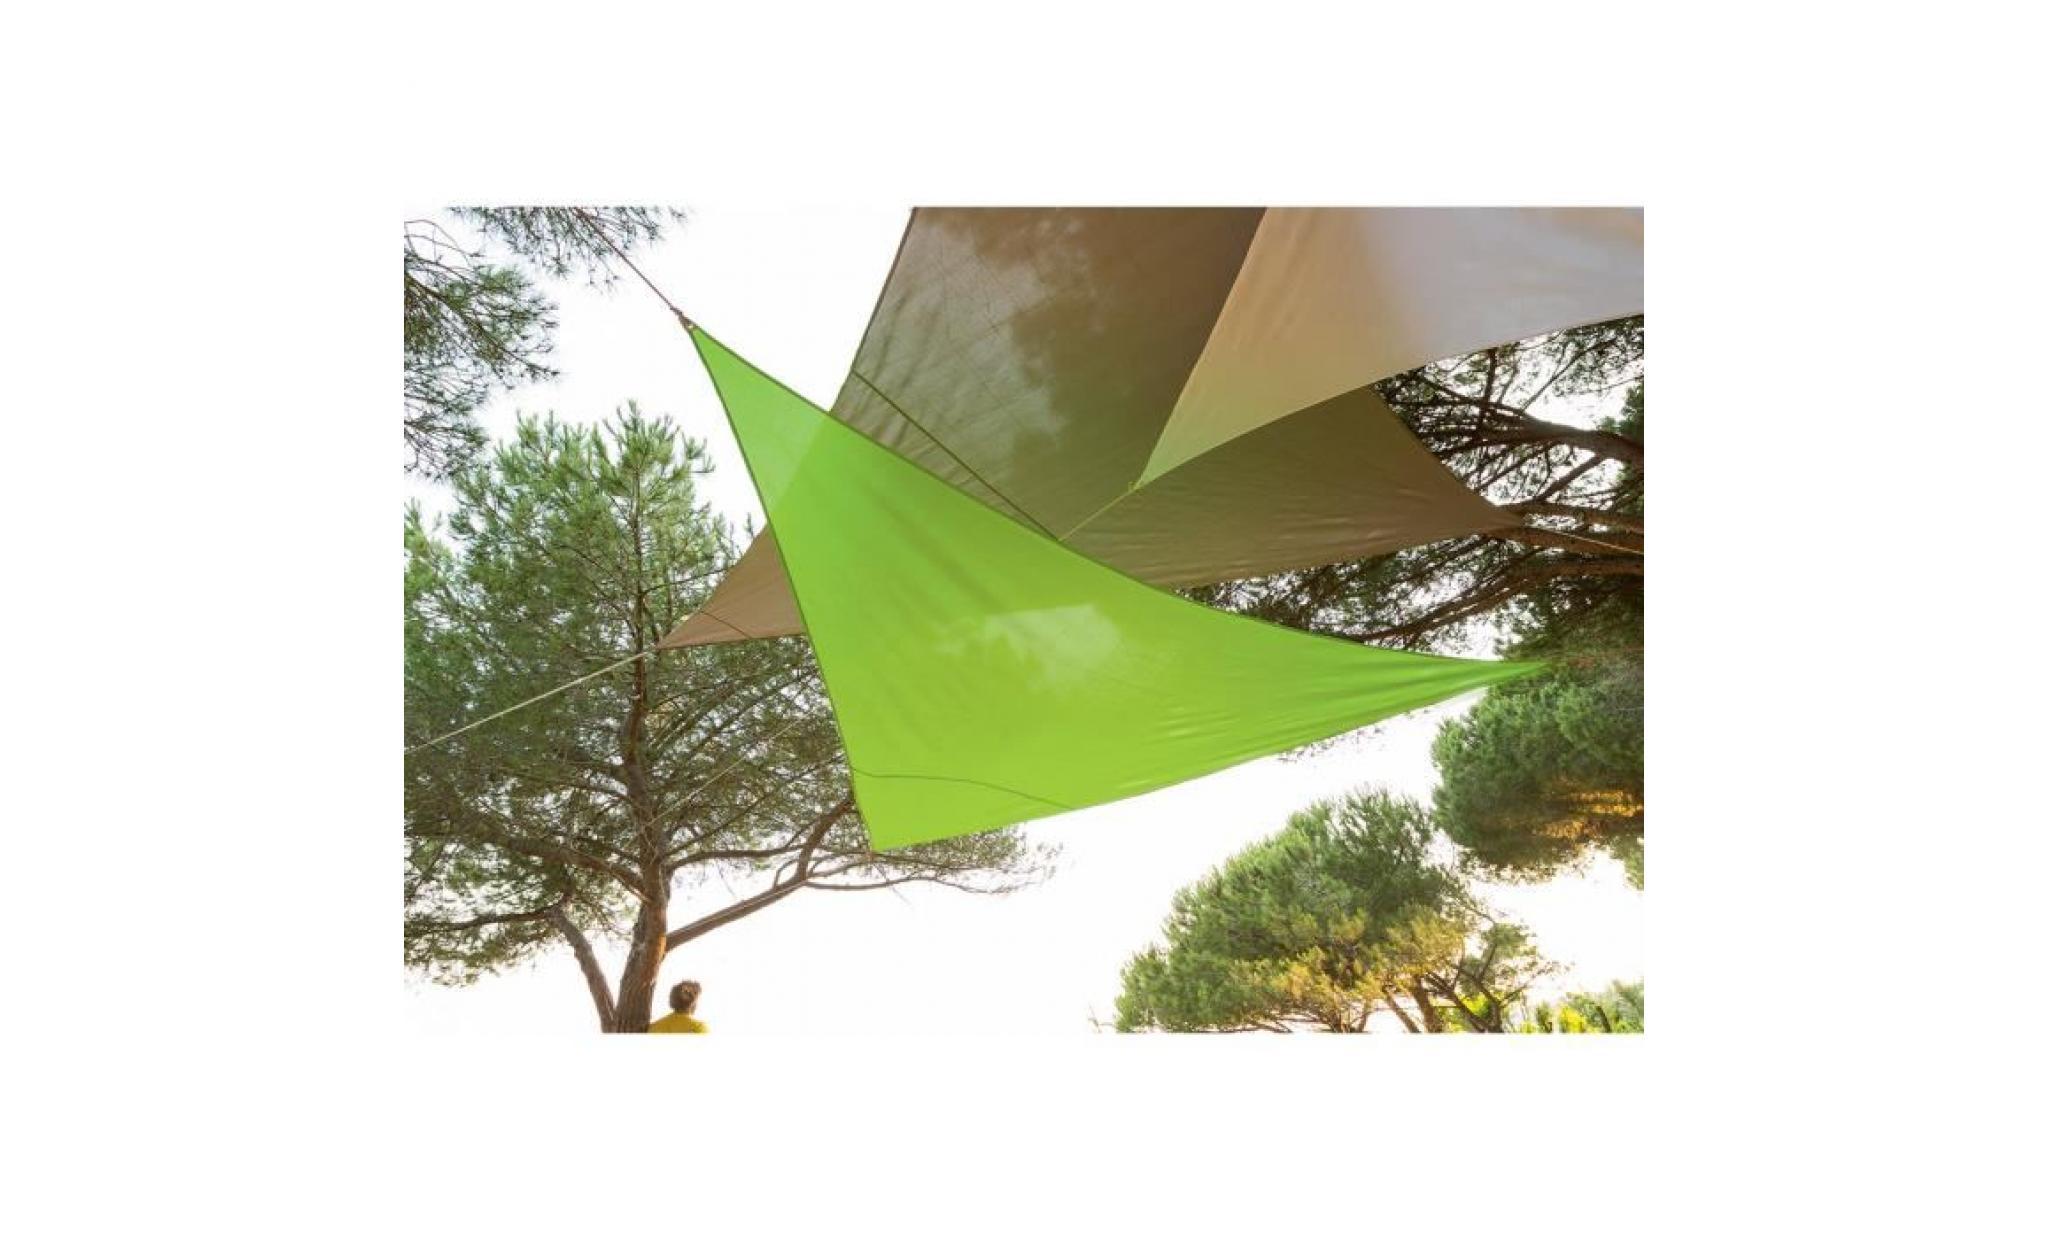 toile solaire voile d 39 ombrage 3 x 3 x 3 m imper achat vente voile ombrage pas cher. Black Bedroom Furniture Sets. Home Design Ideas